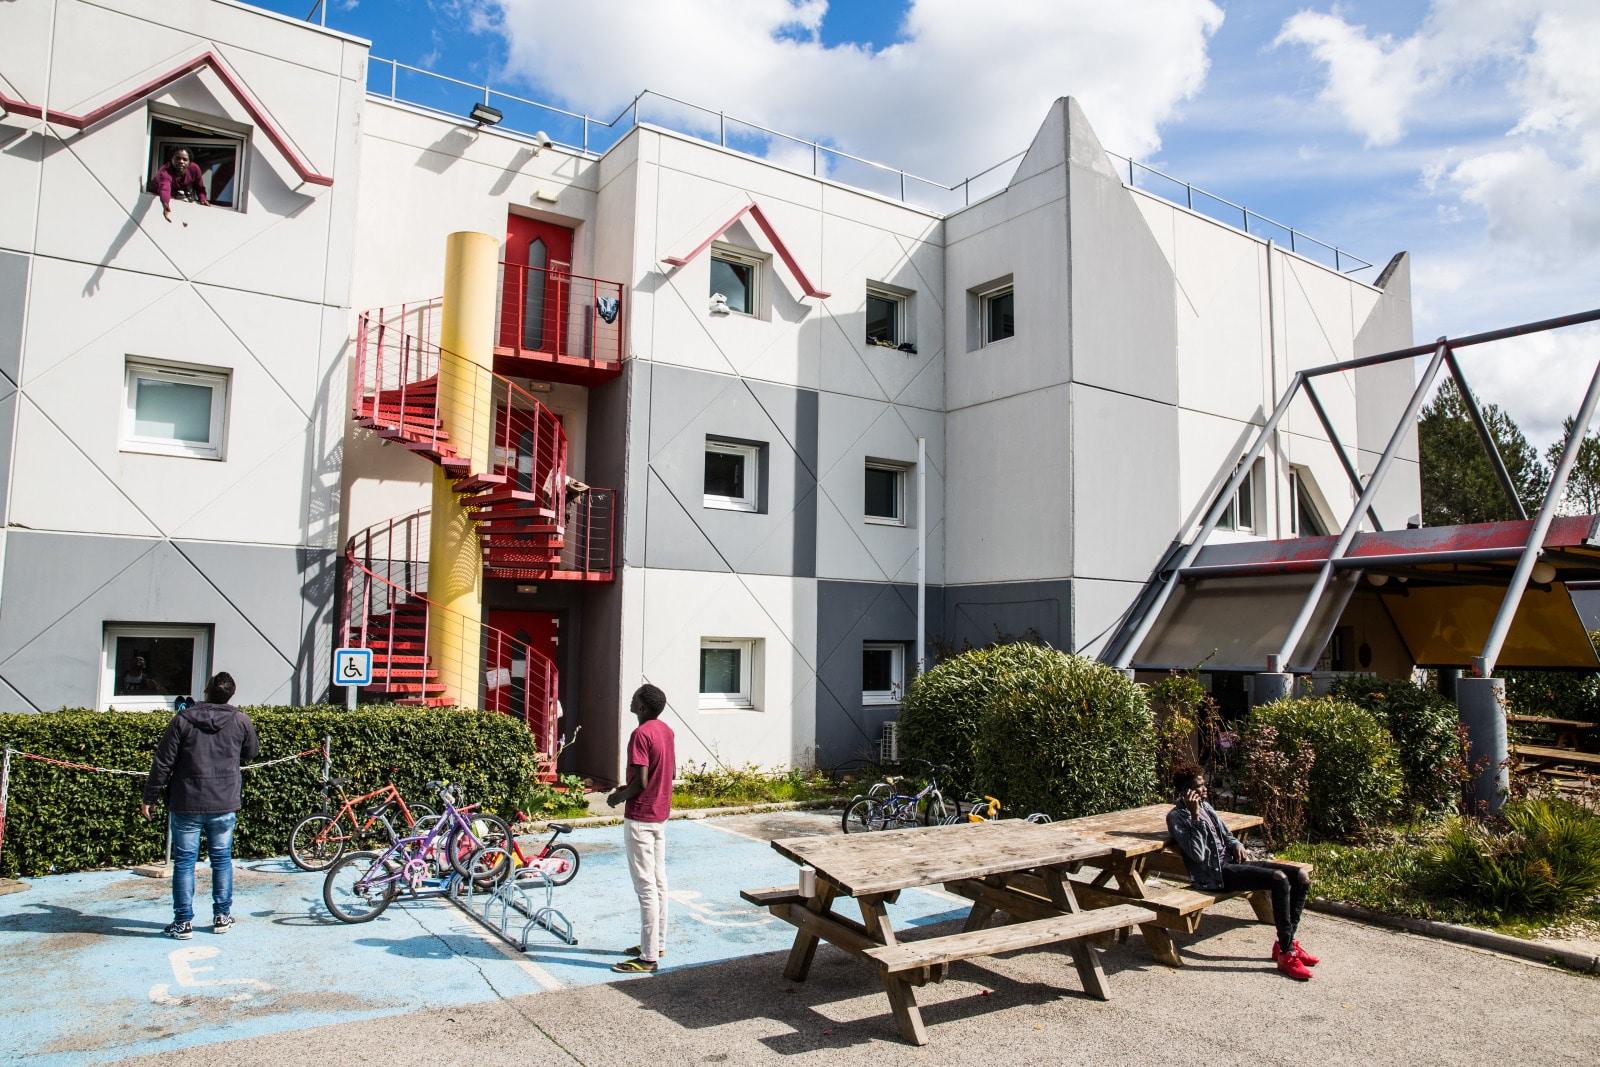 Hémisphère, centre d'hébergement PRADHA - Crédits D.Richard